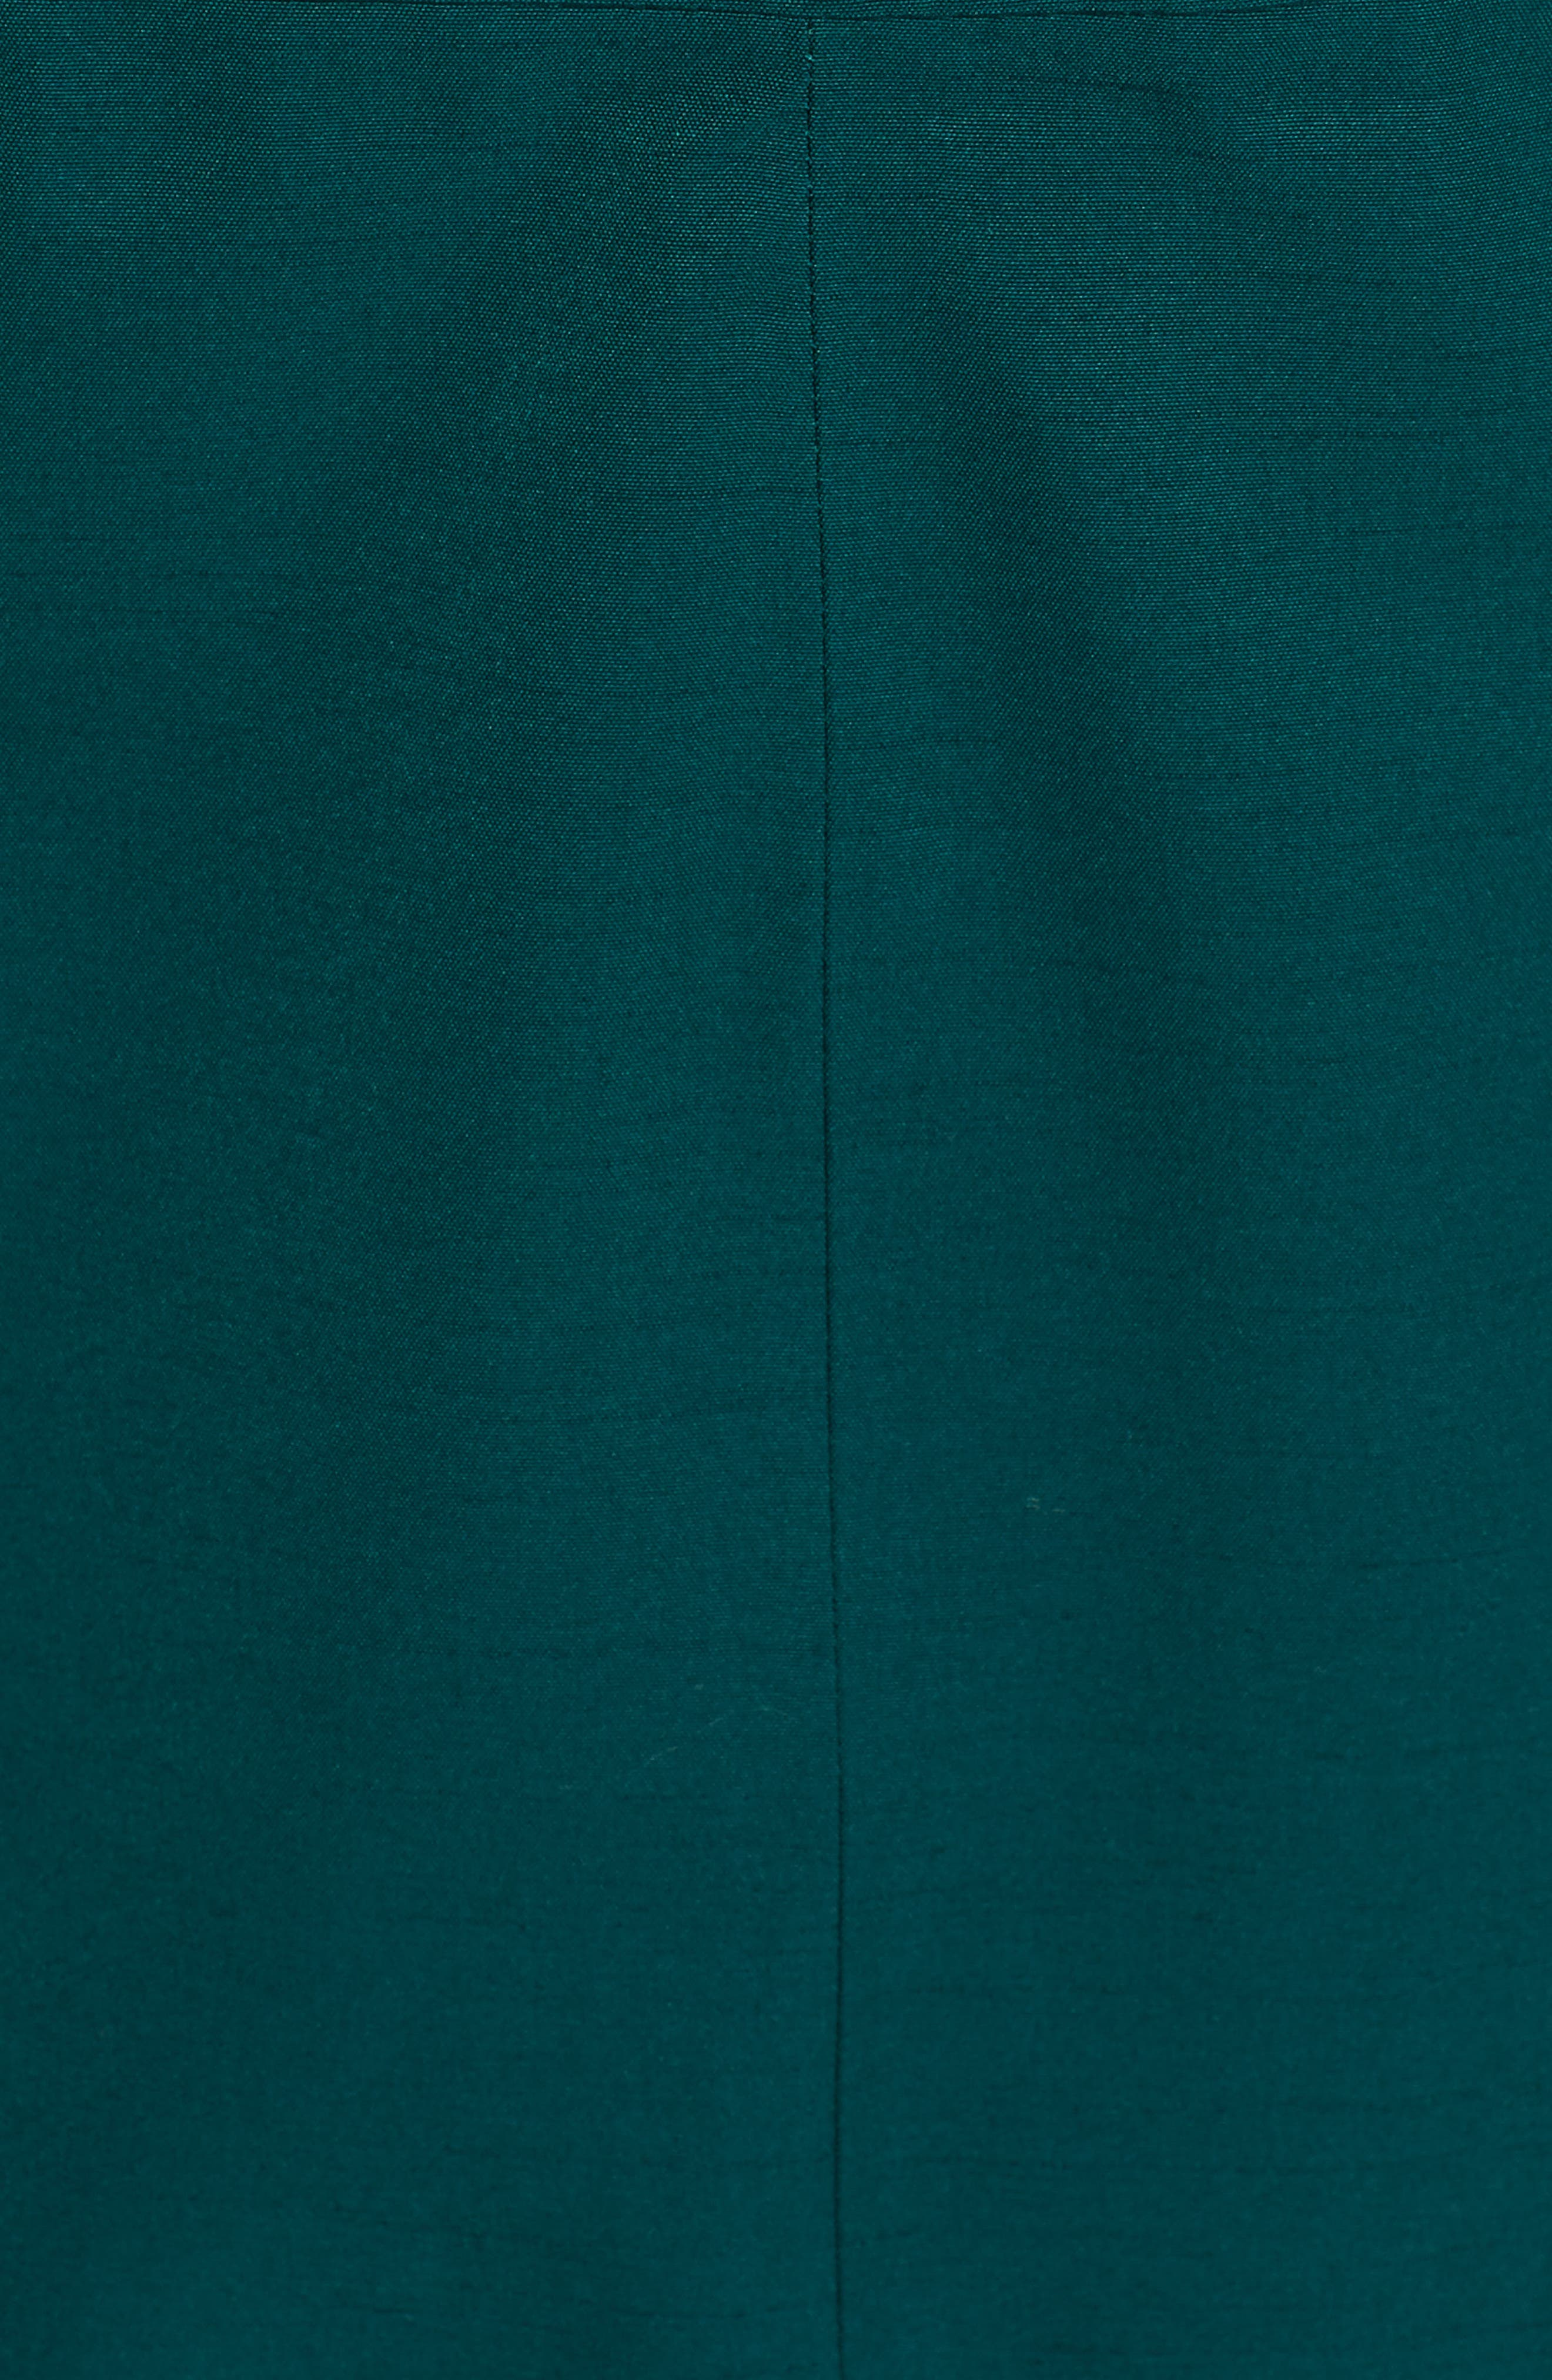 THE NORTH FACE,                             Ancha Hooded Waterproof Parka,                             Alternate thumbnail 7, color,                             BOTANICAL GARDEN GREEN